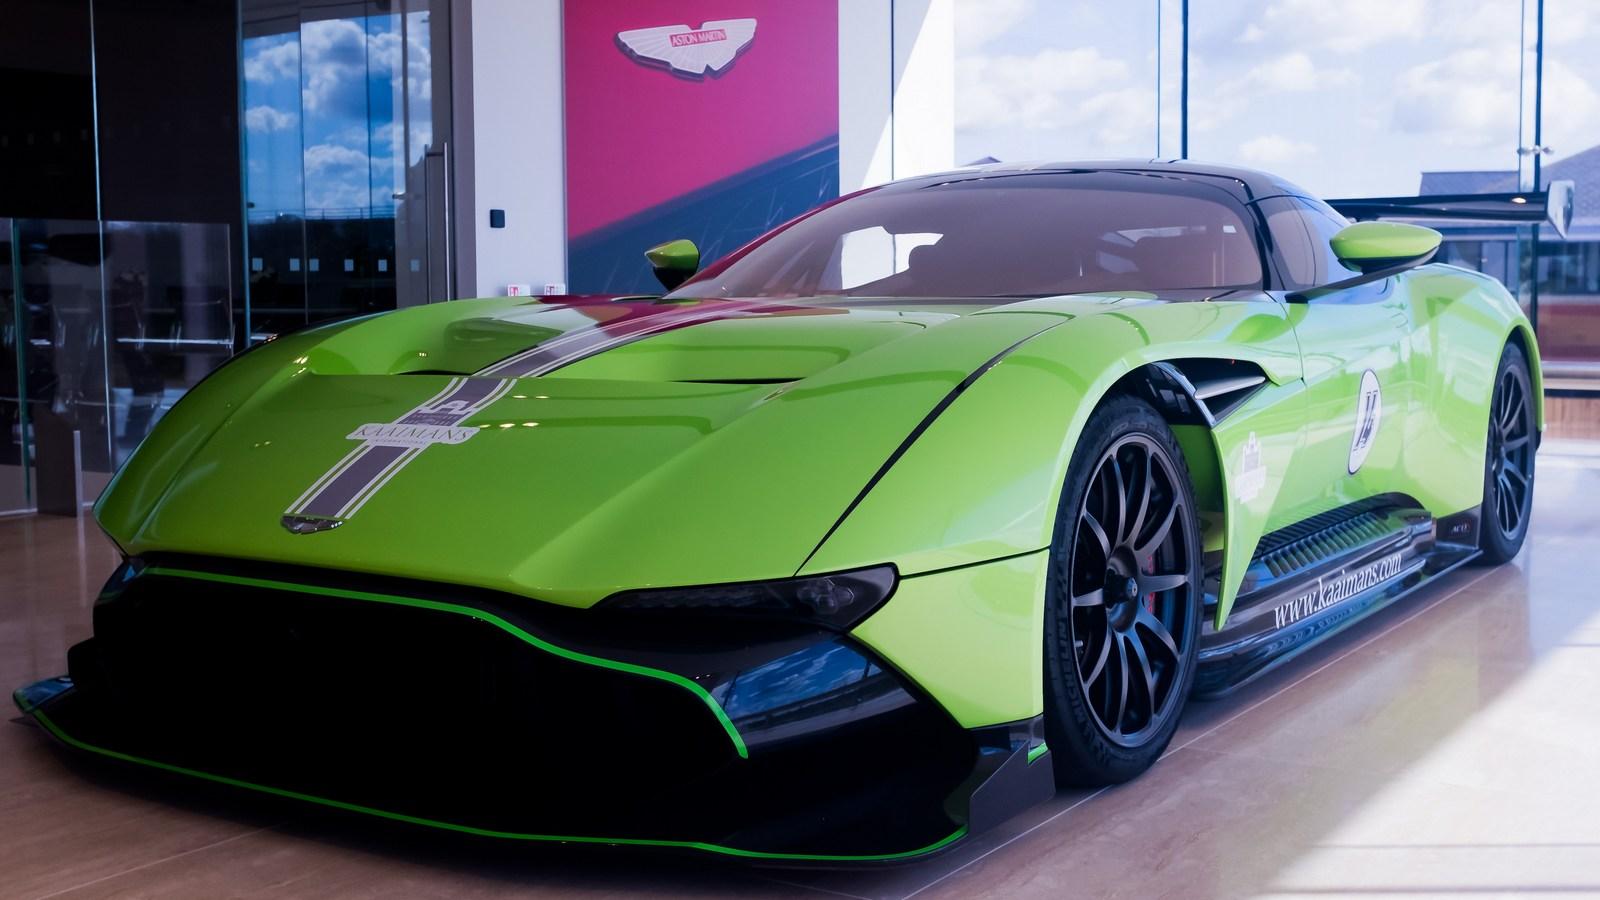 Sieu Xe đua Aston Martin Vulcan Mau Xanh độc đao Co Gia 3 6 Triệu Usd We Love Car